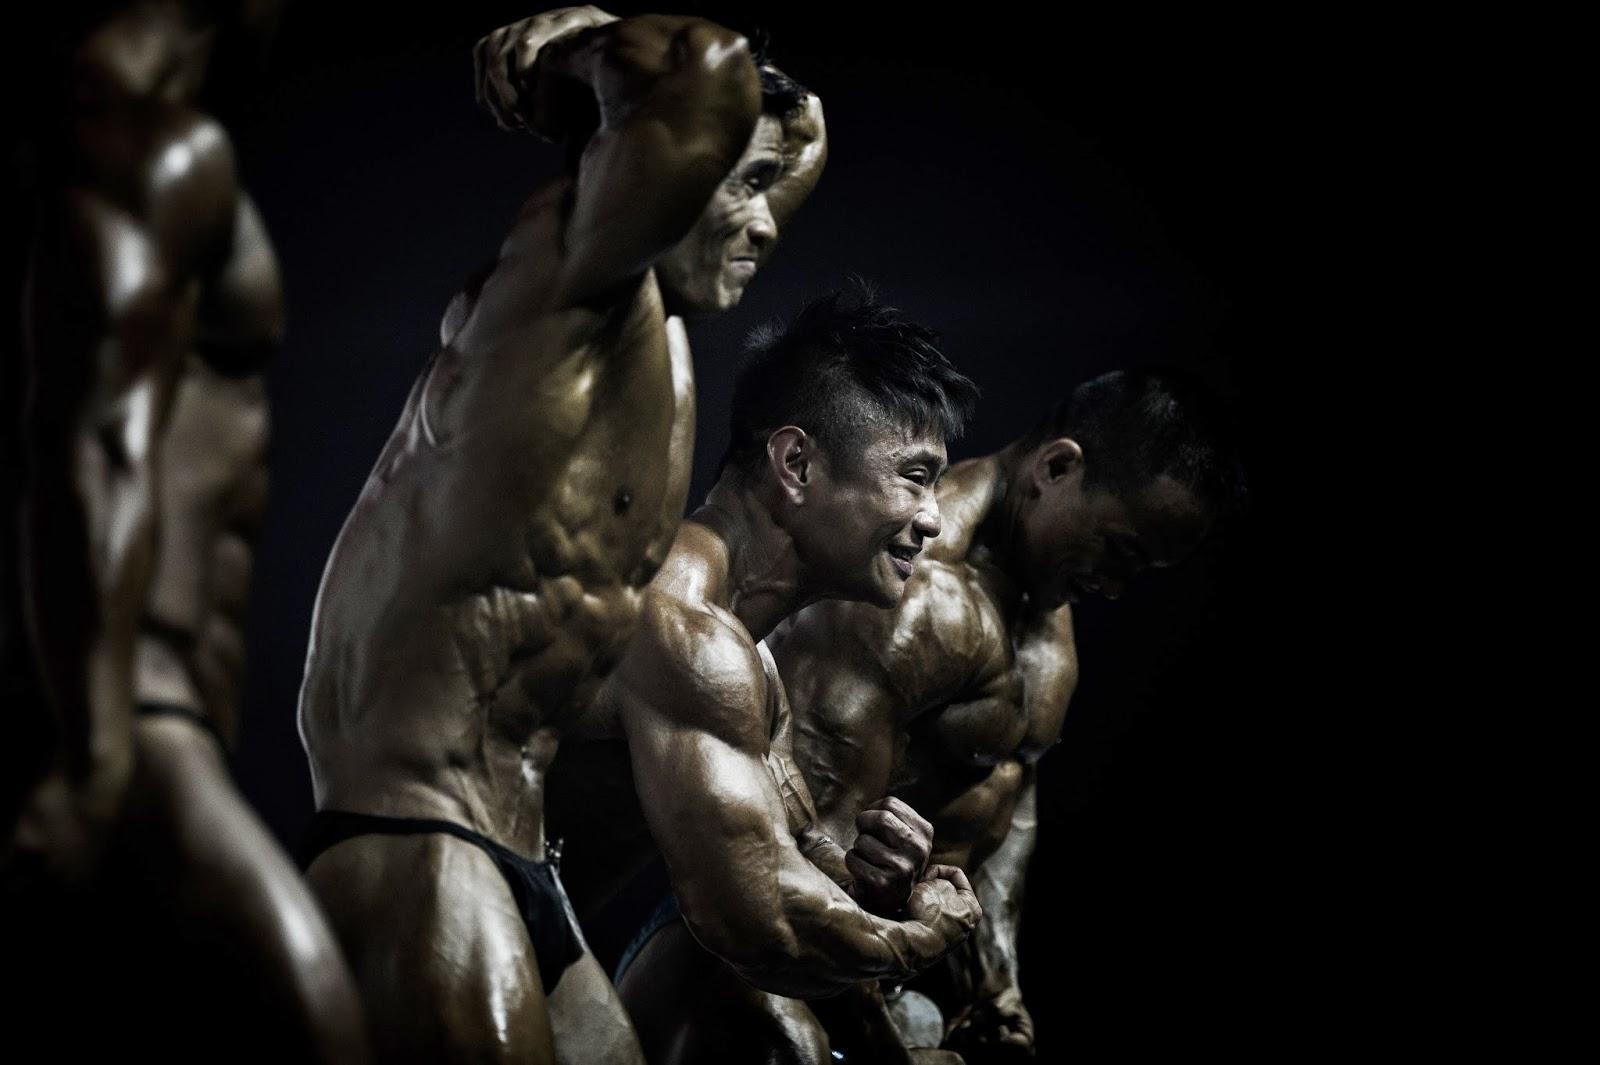 Bodybuilding, Championship, China, Exercise, Fitness, Gym, Hong Kong, Human Body, International Bodybuilding and Fitness Invitation Championship, Sports,